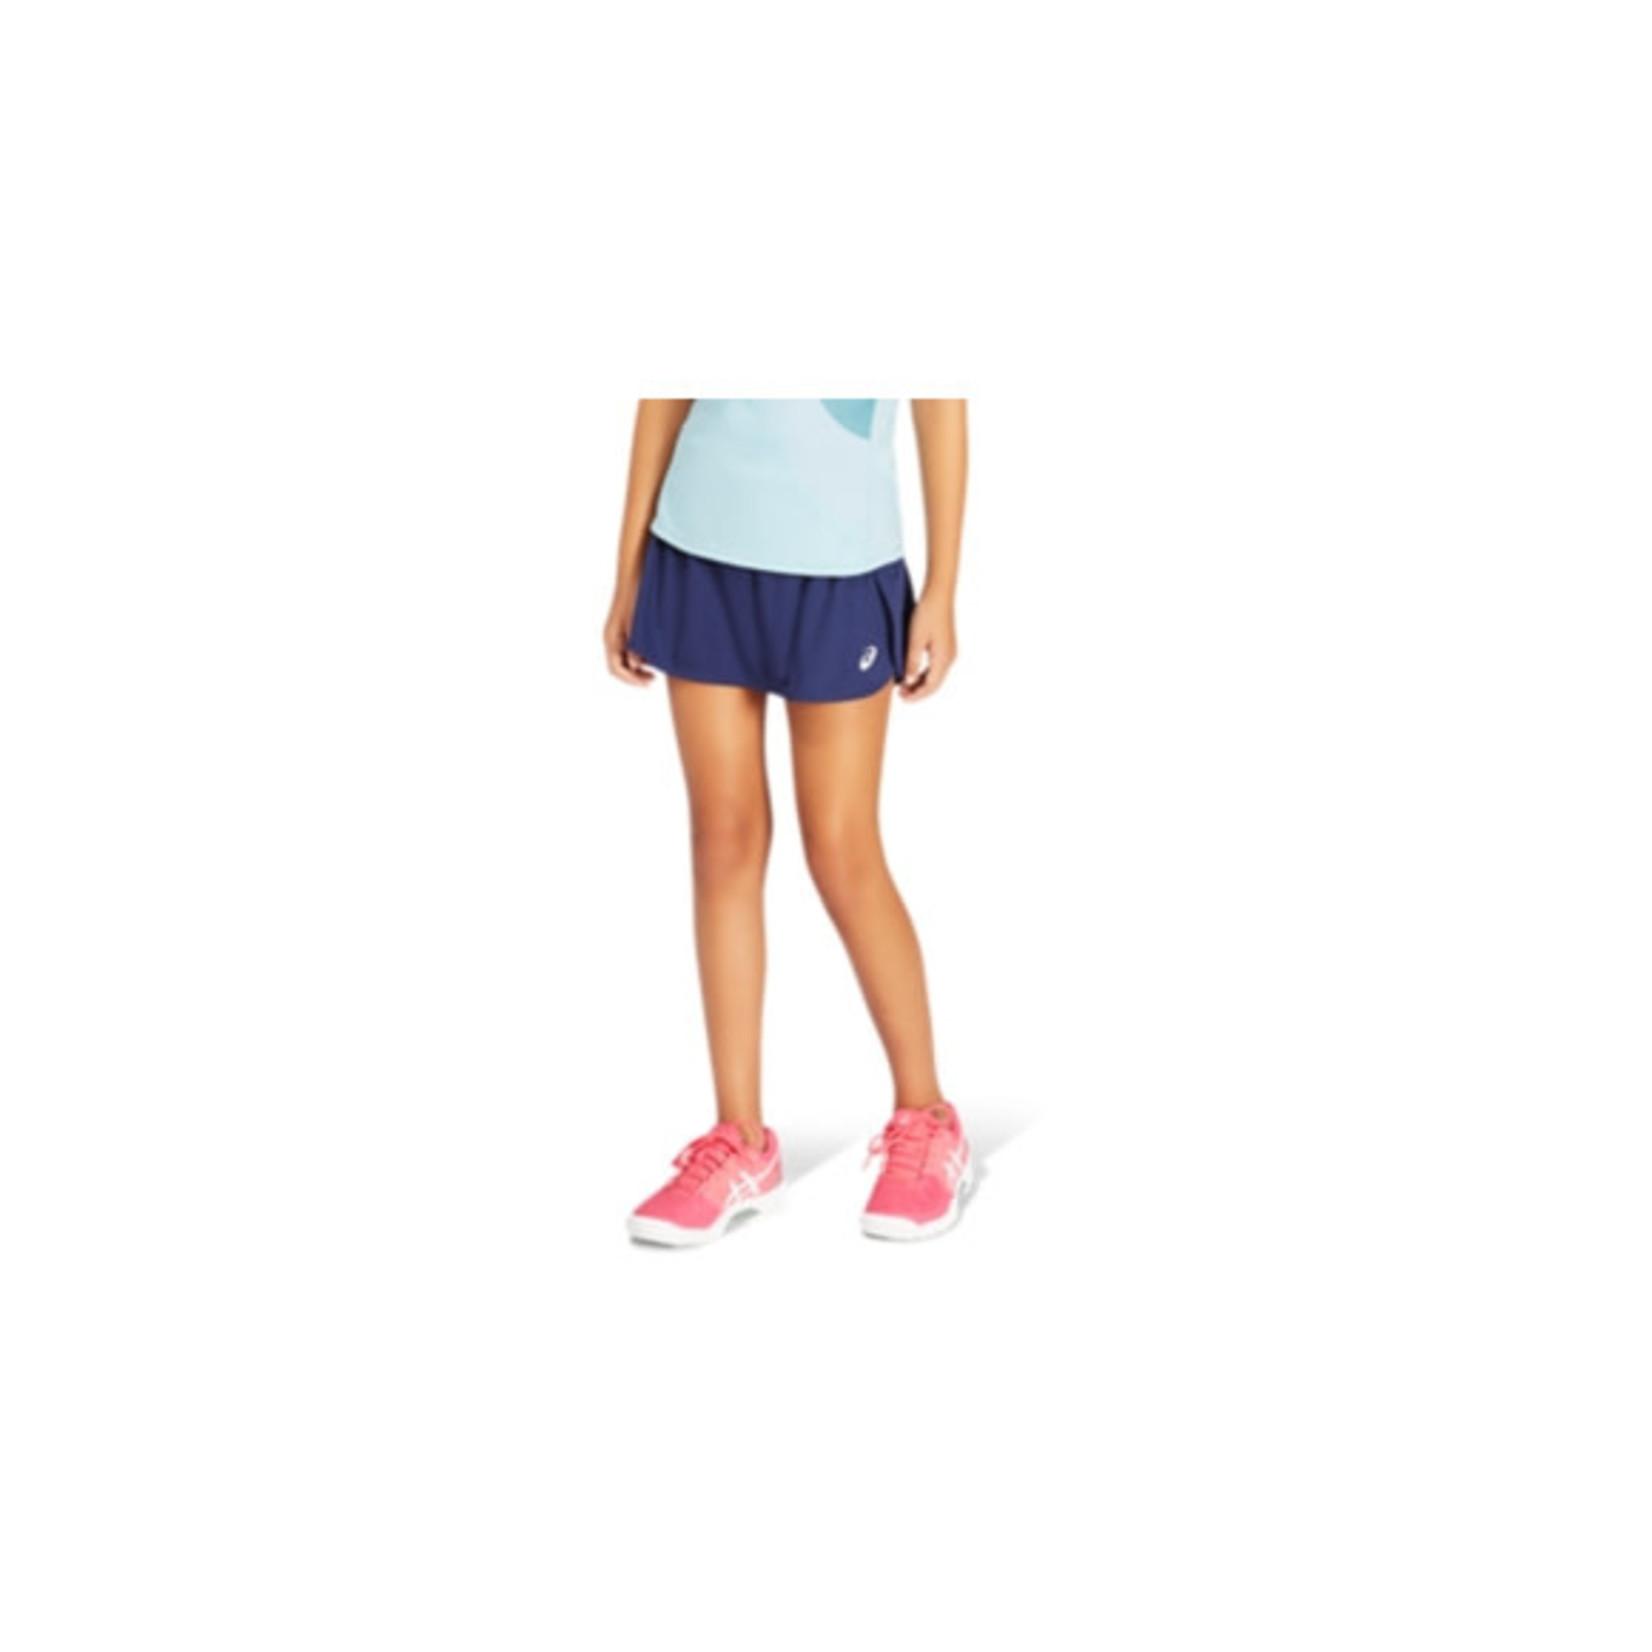 Asics Meisjes - Tennisrok Donkerblauw